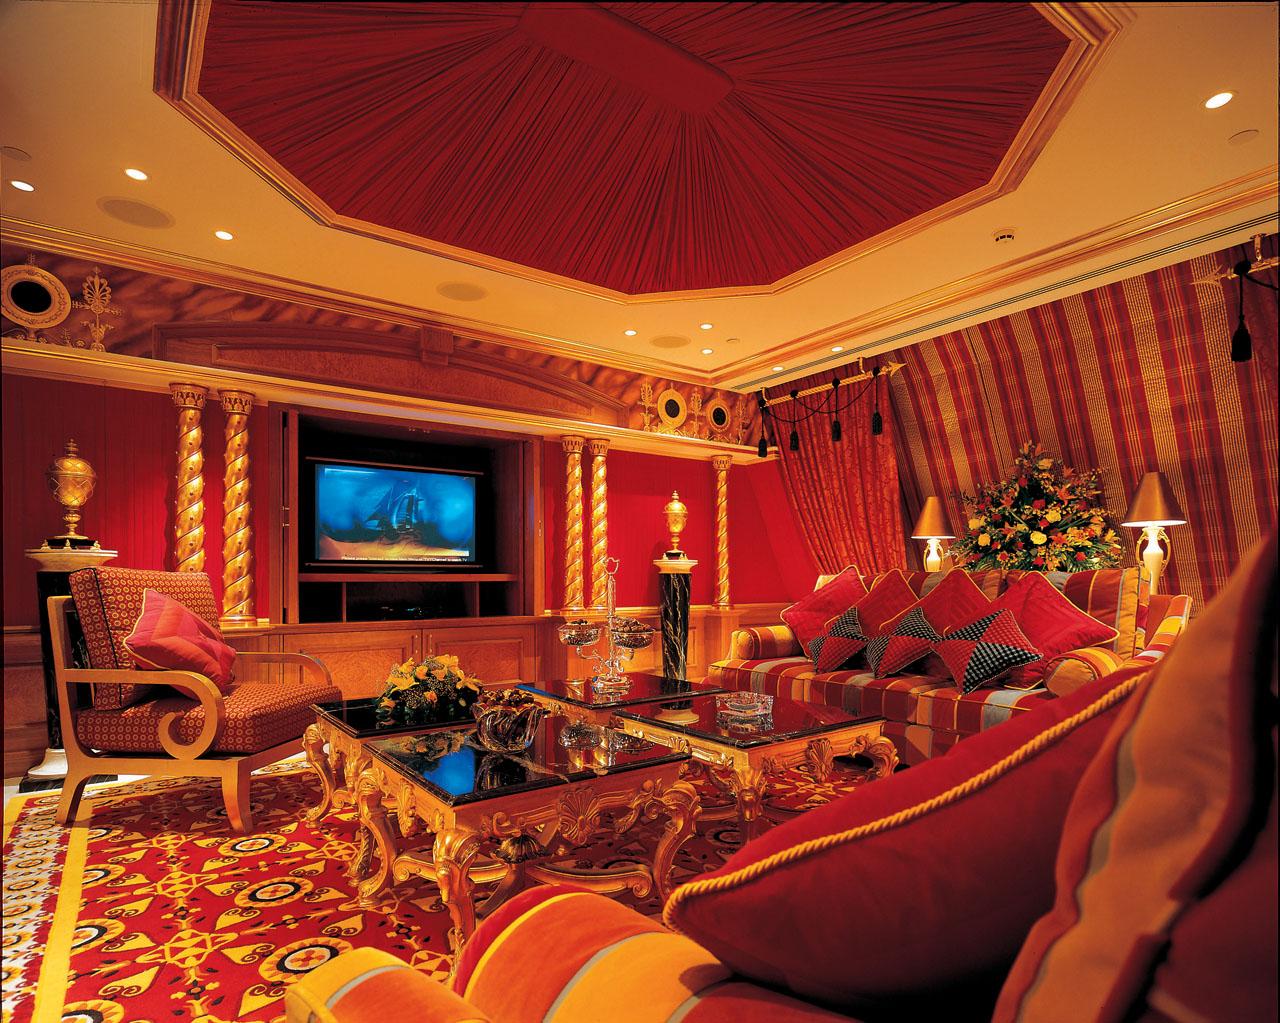 Aleda costa dubai burj al arab sevsen star hotel for Burj arab hotel